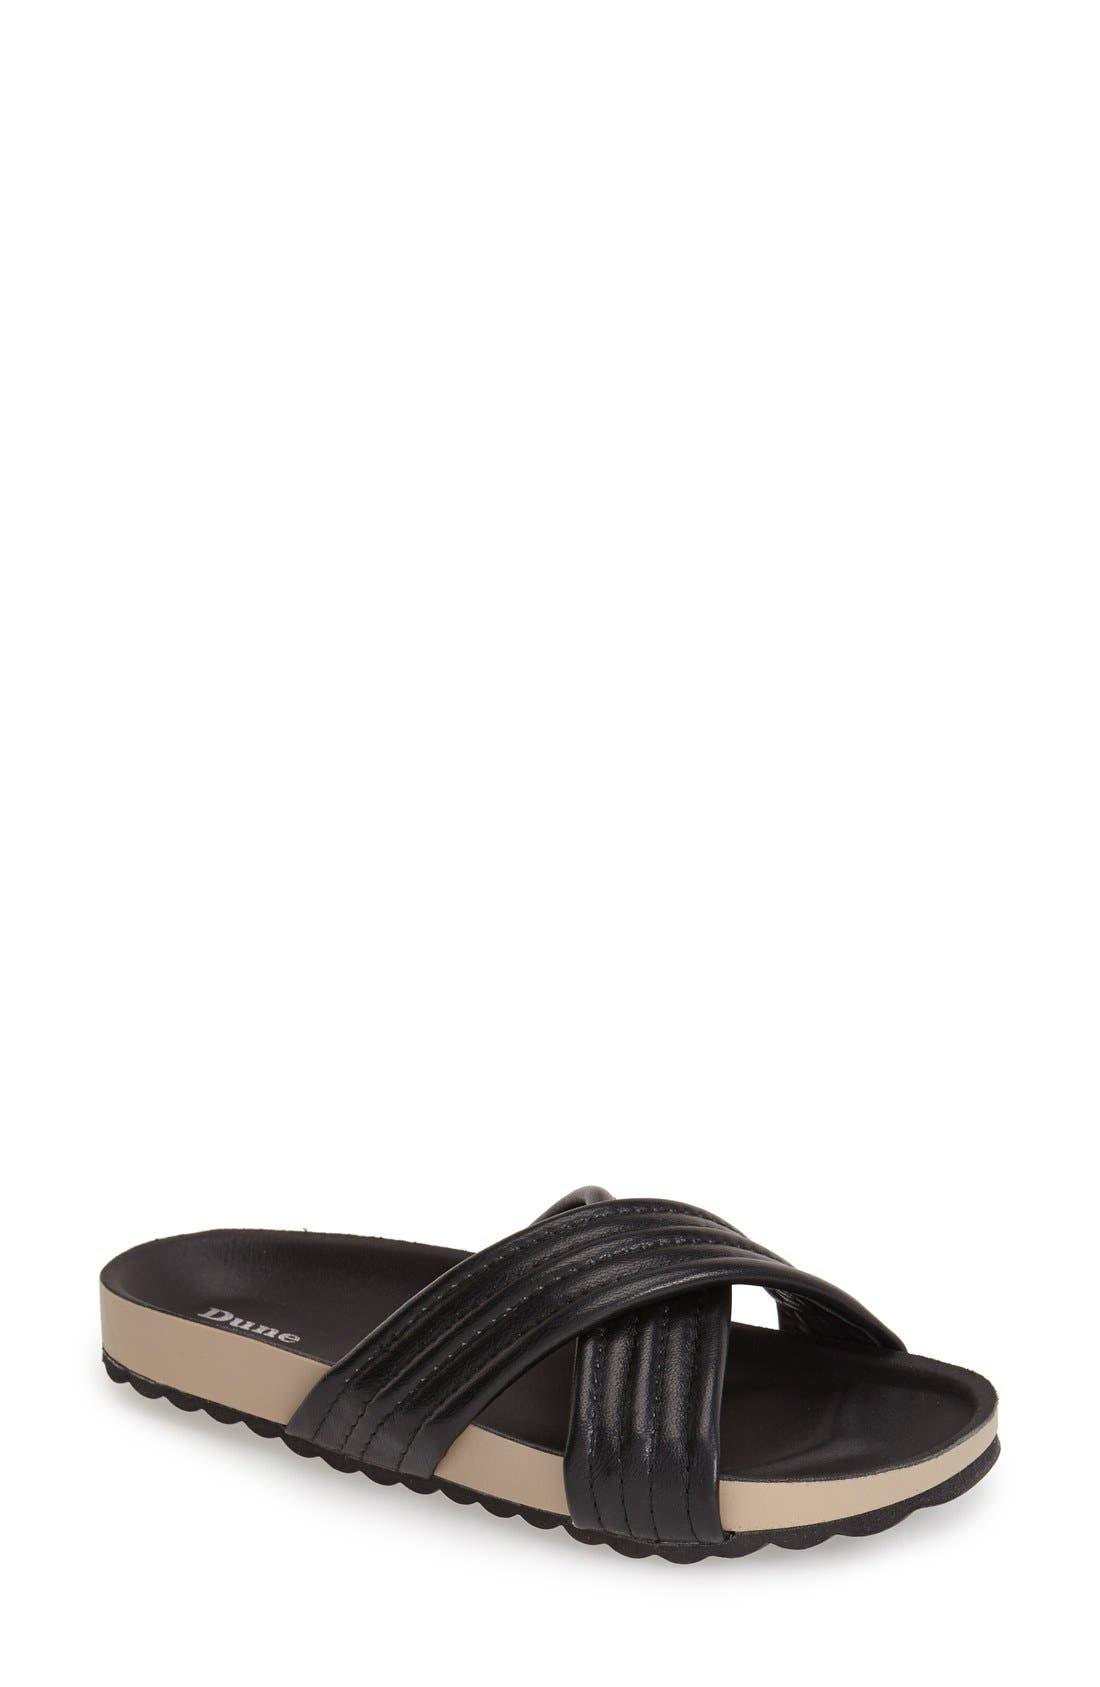 DUNE LONDON, 'Jolenes' Leather Slide Sandal, Main thumbnail 1, color, 002